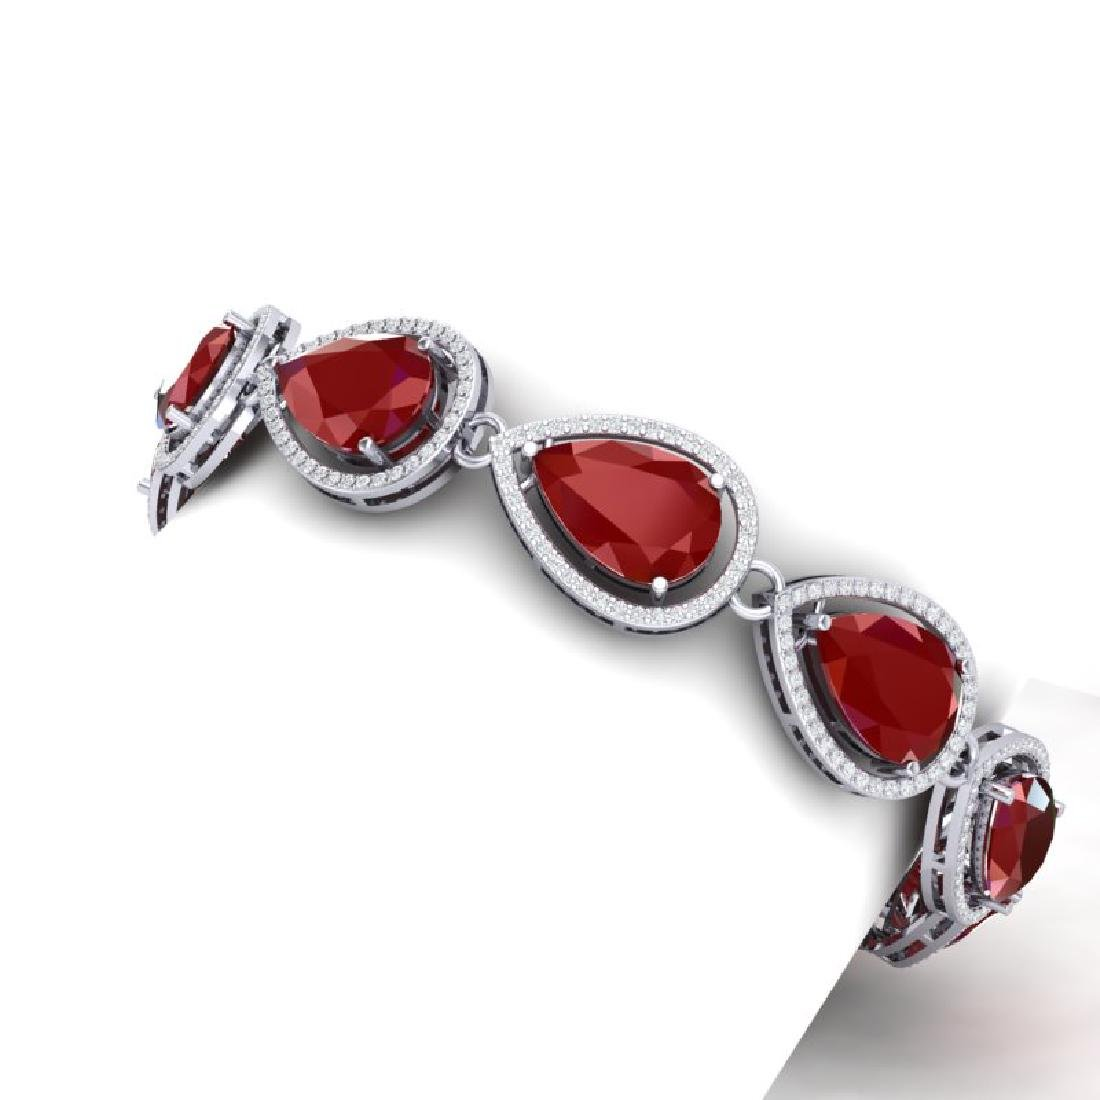 28.31 CTW Royalty Ruby & VS Diamond Bracelet 18K White - 2